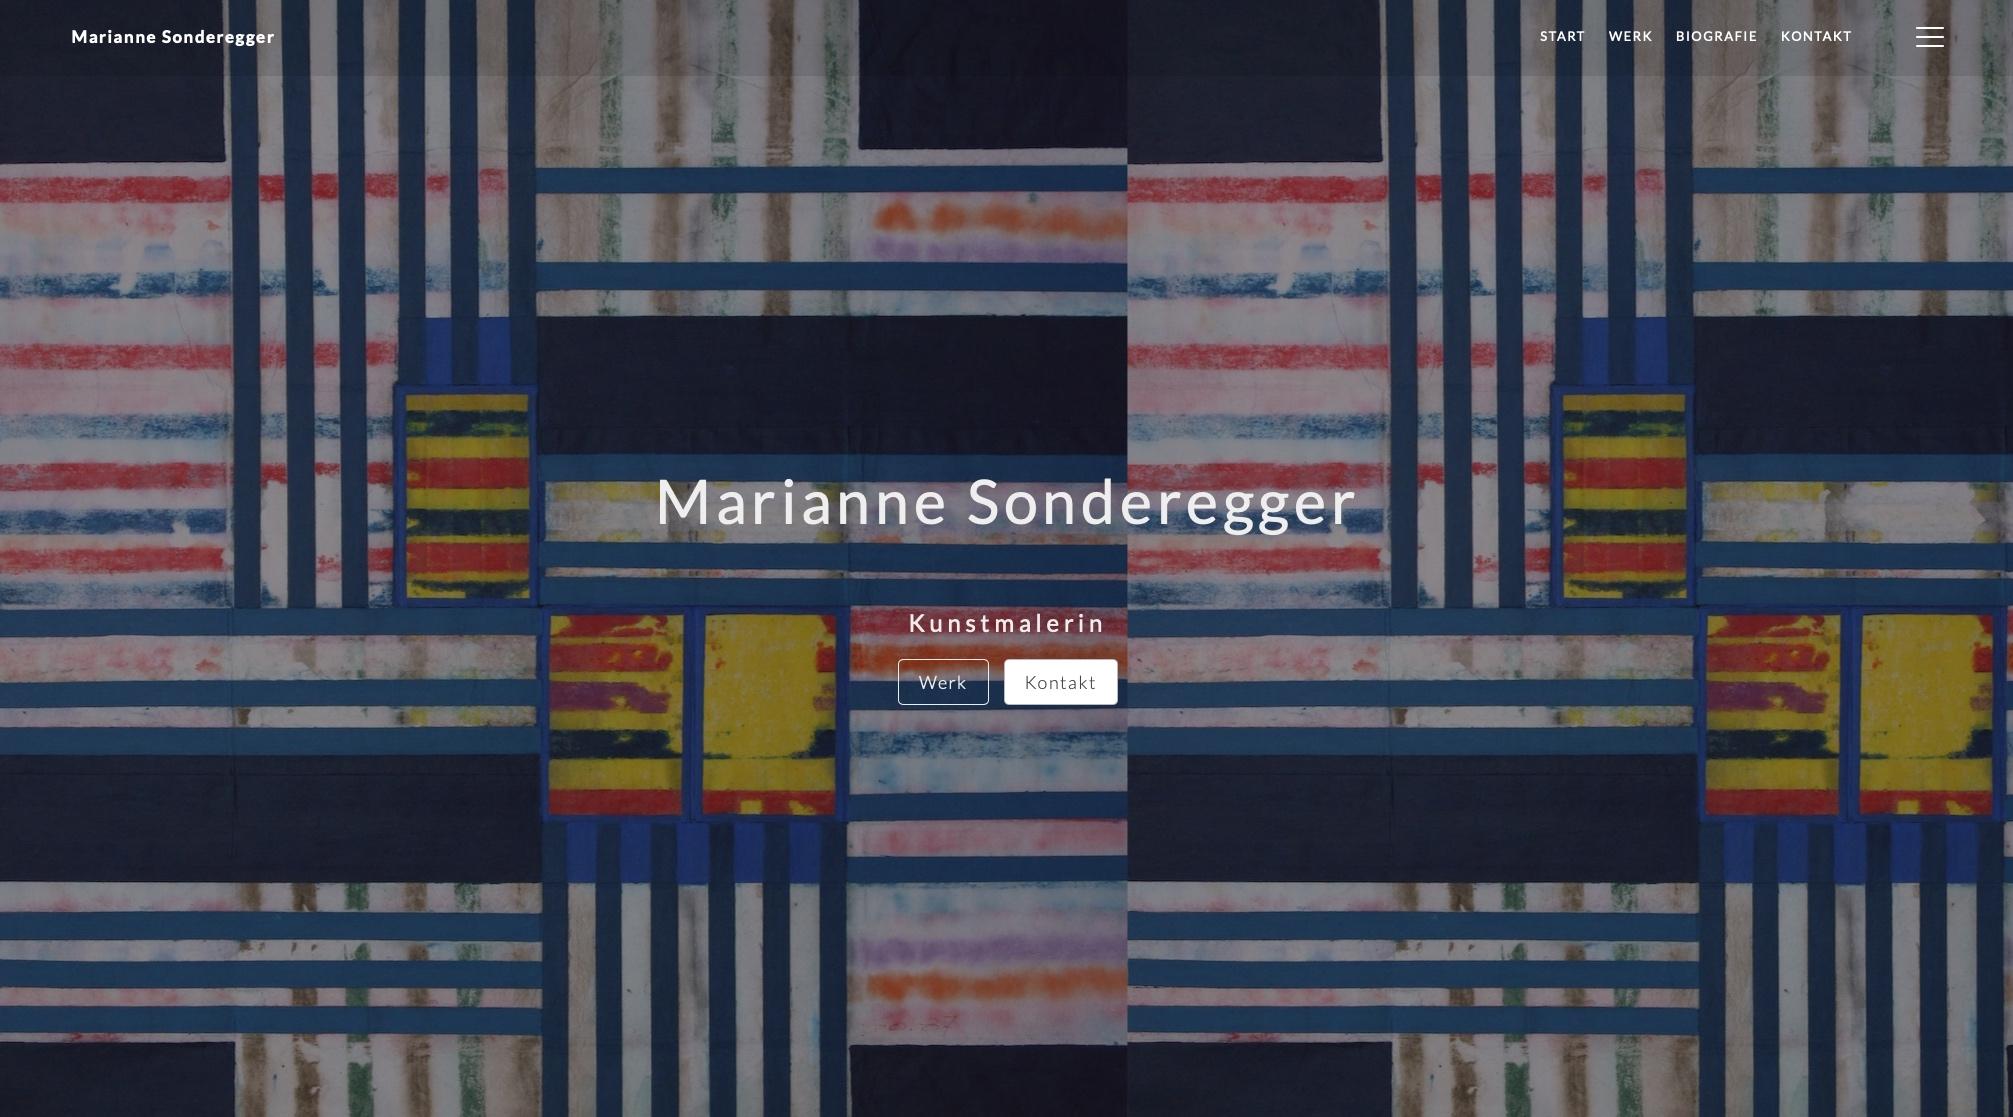 WordPress Webseite Kunstmalerin Marianne Sonderegger 1